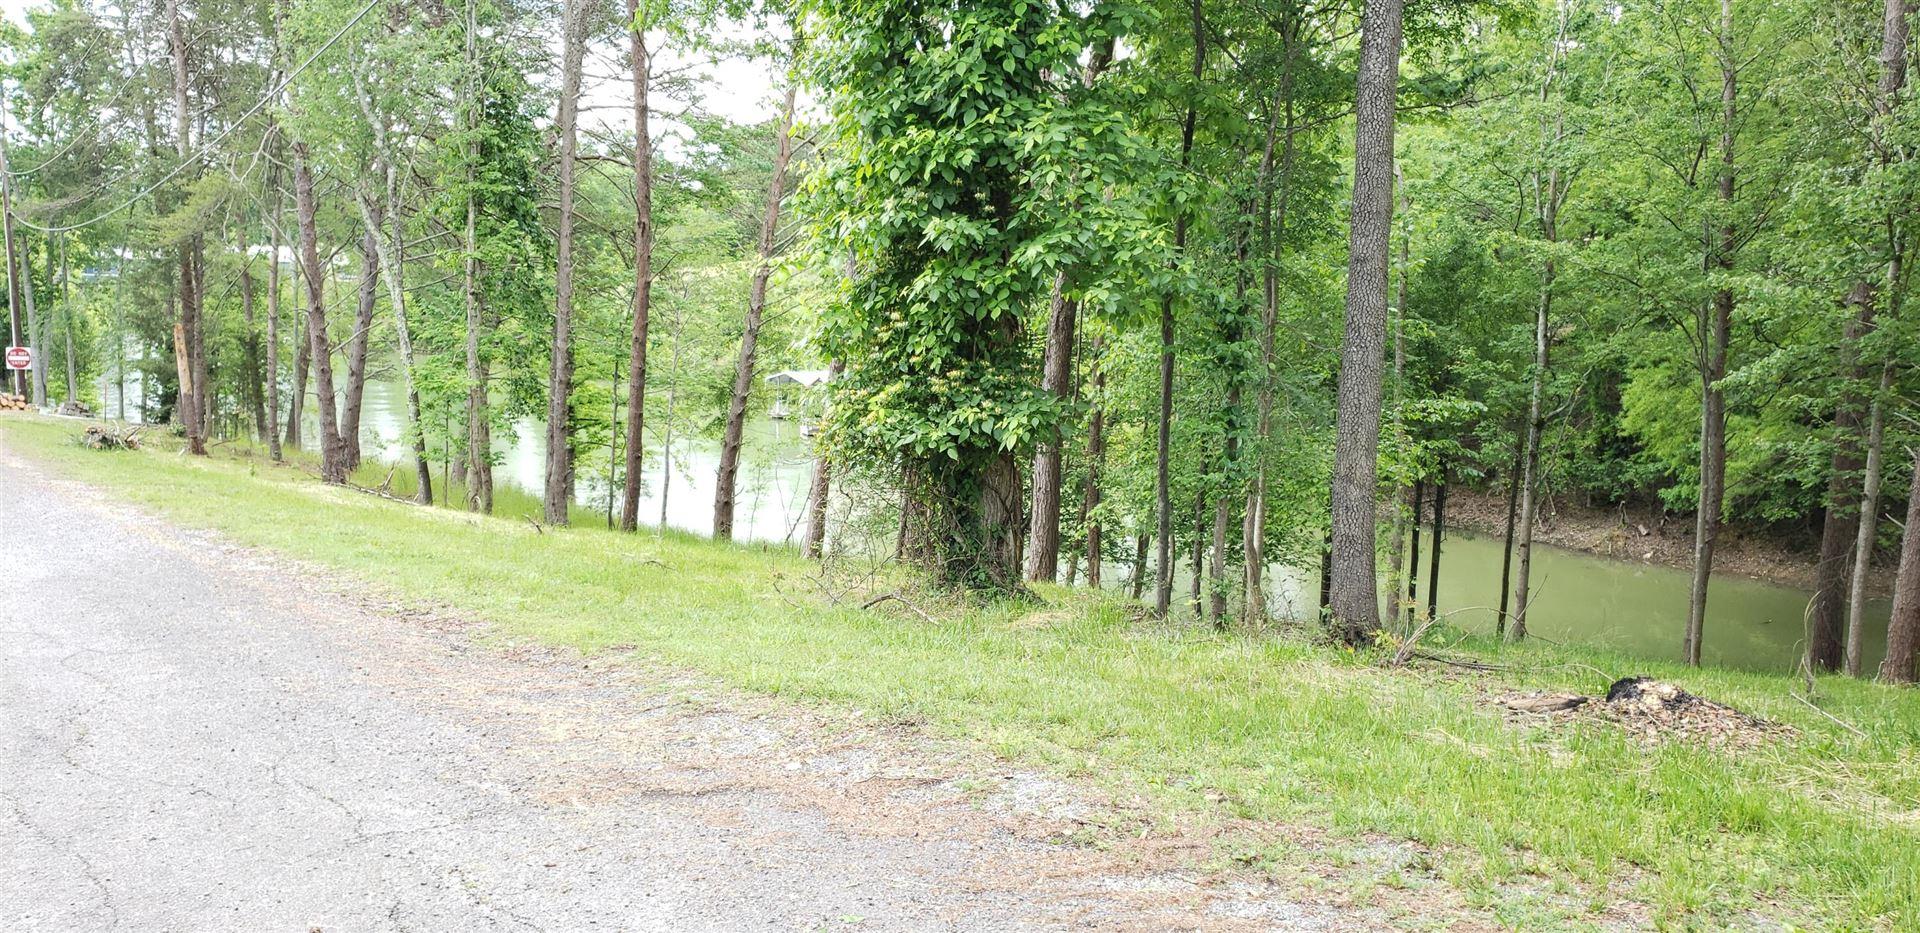 Photo for Galloway Island Drive, Dandridge, TN 37725 (MLS # 1080565)